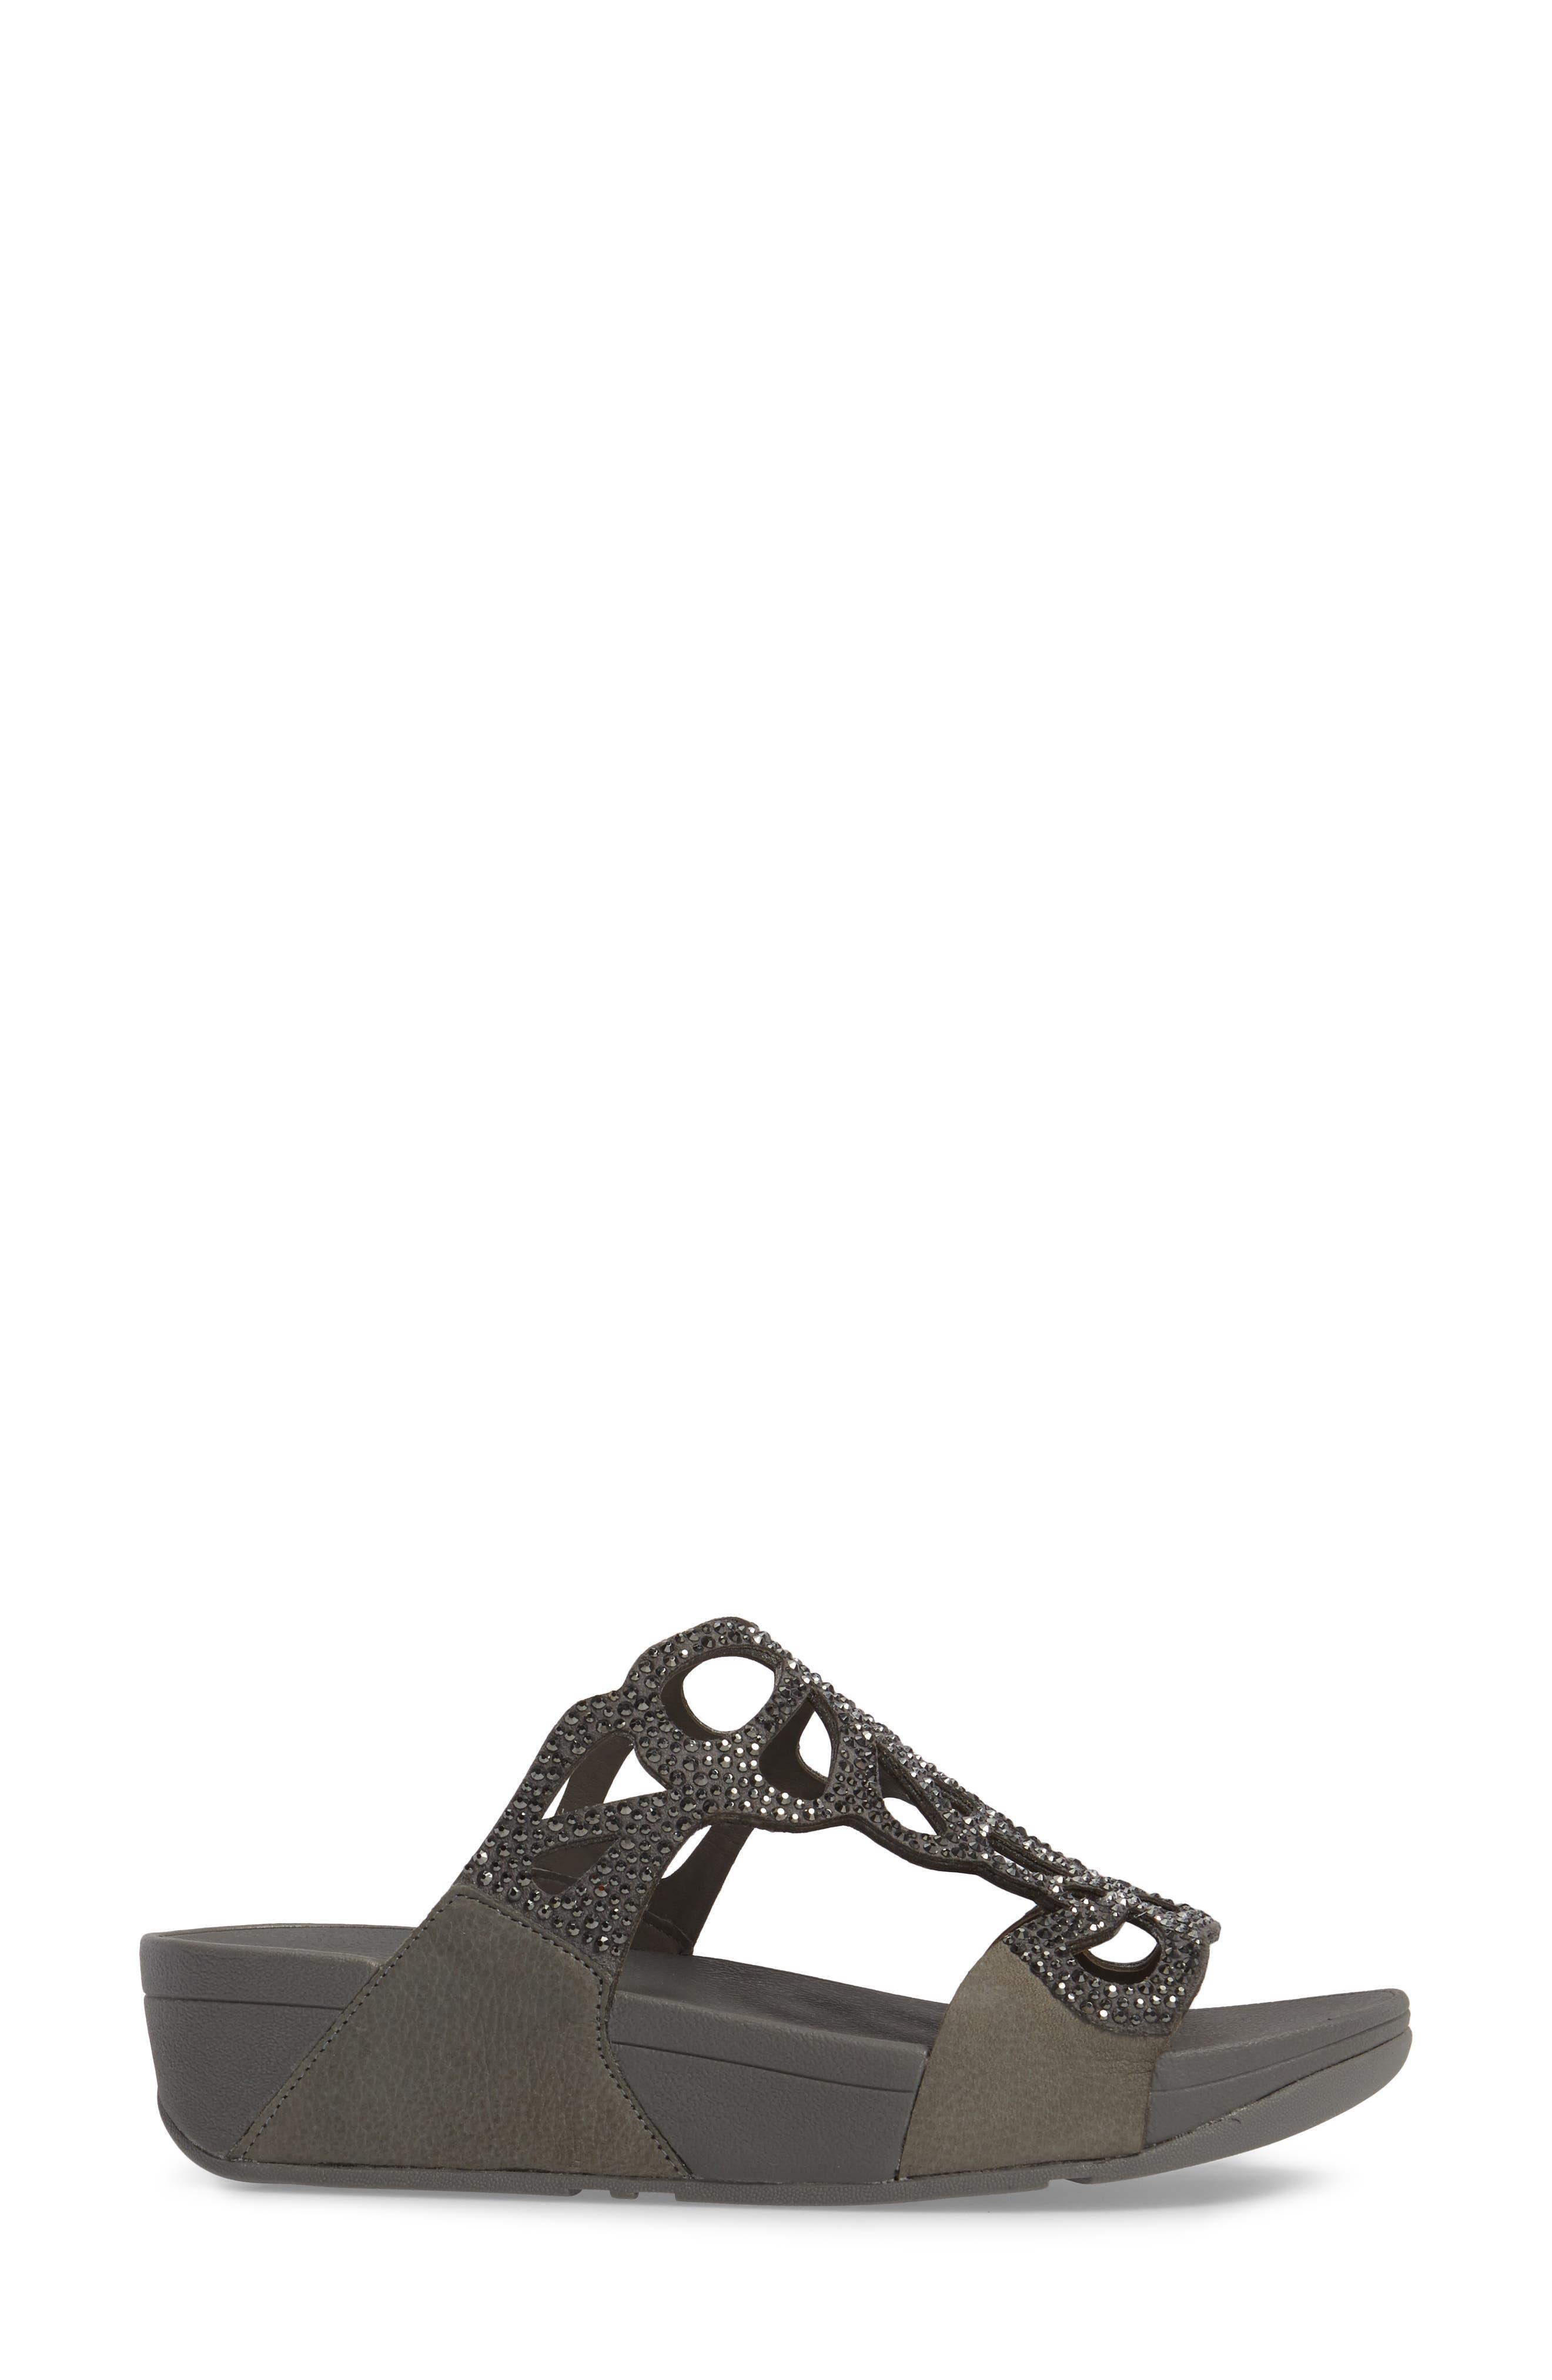 Alternate Image 3  - FitFlop Bumble Wedge Slide Sandal